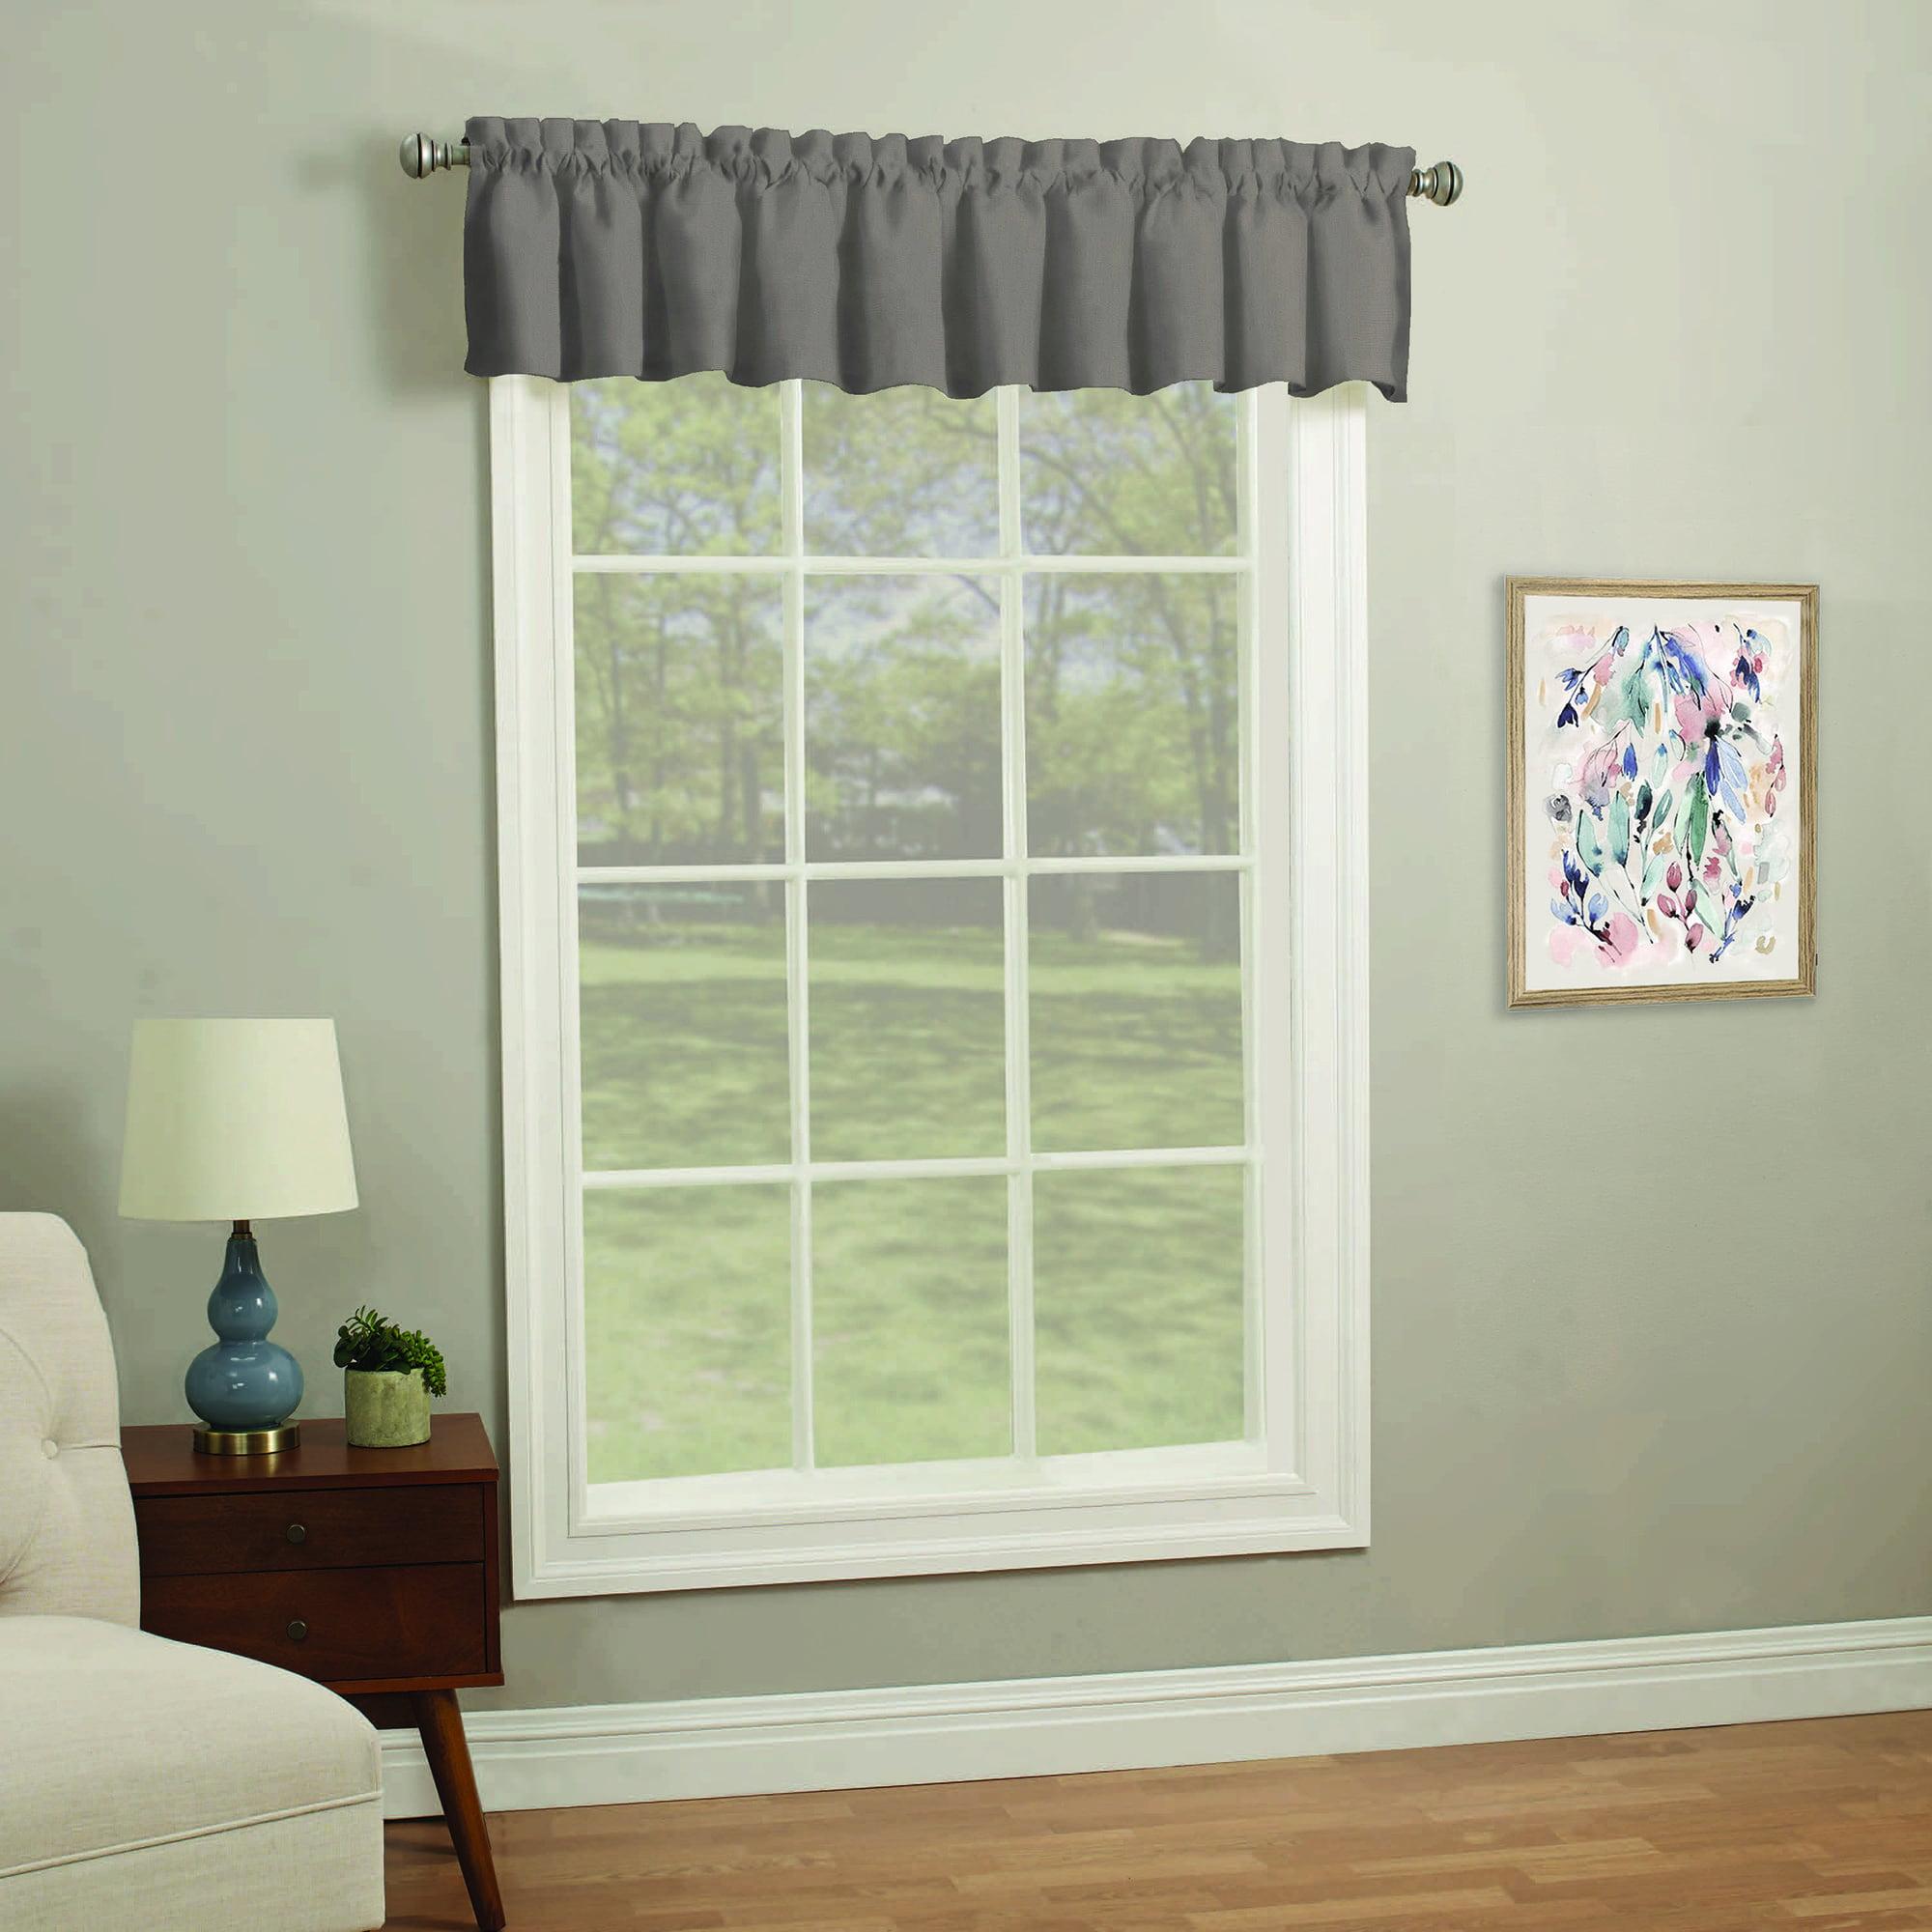 Mainstays 56'' x 14'' Fashion Solid Window Curtain Valance